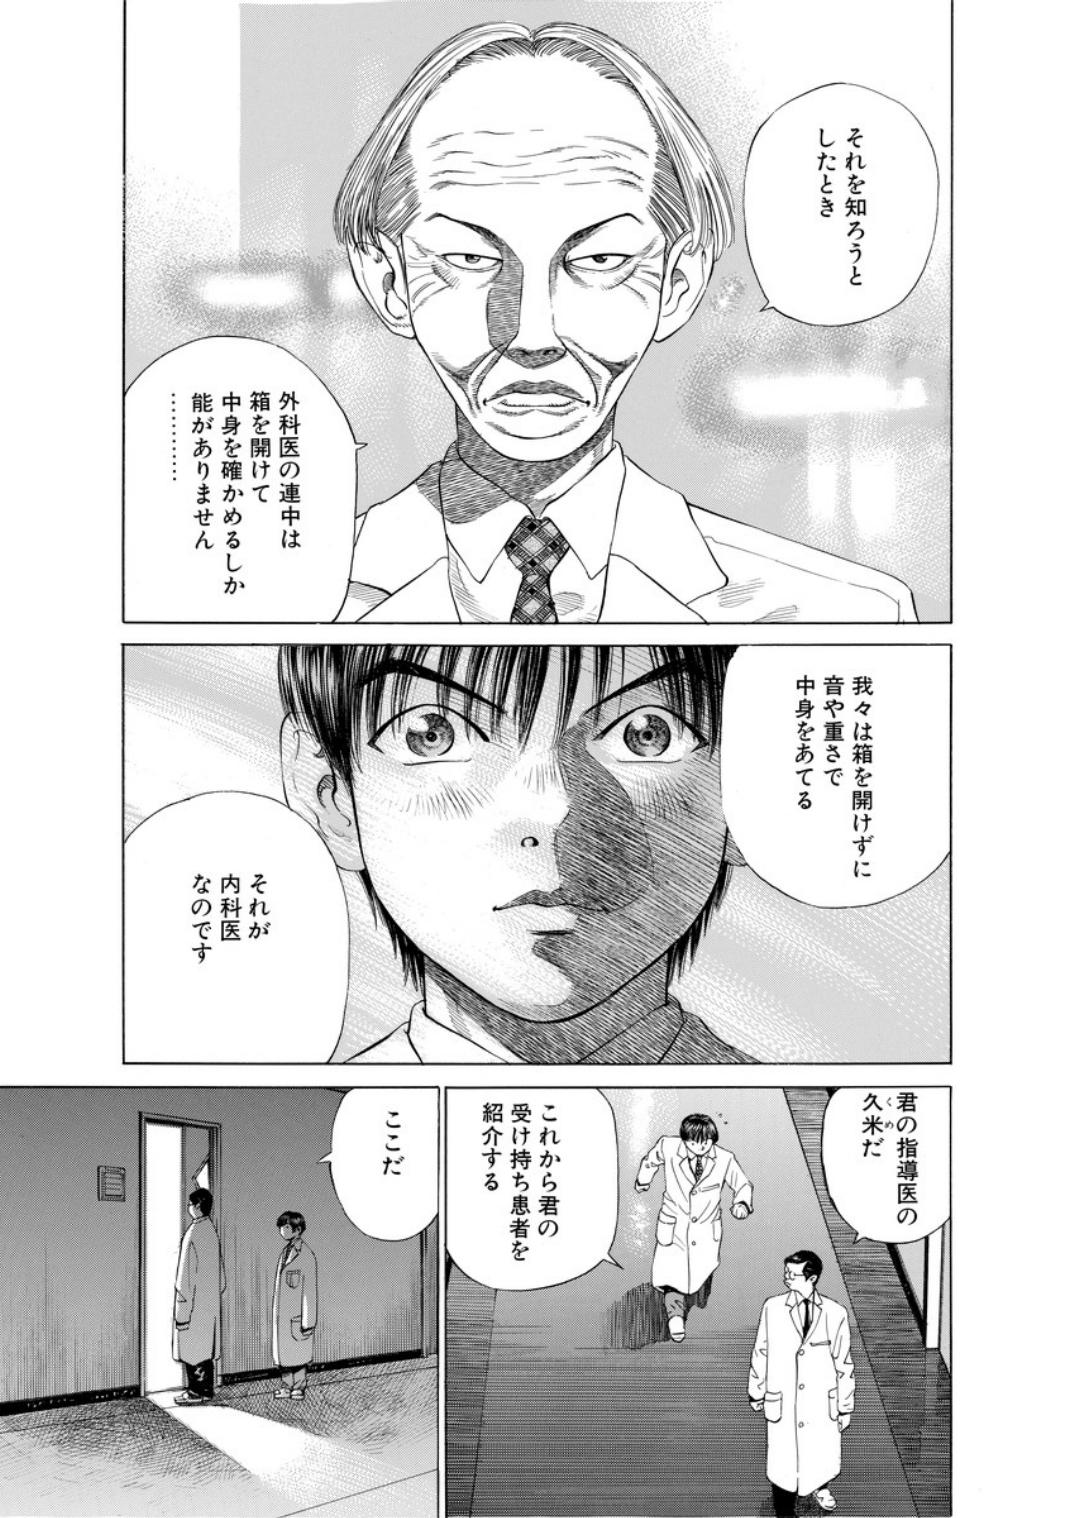 001bj_page-0163.jpg